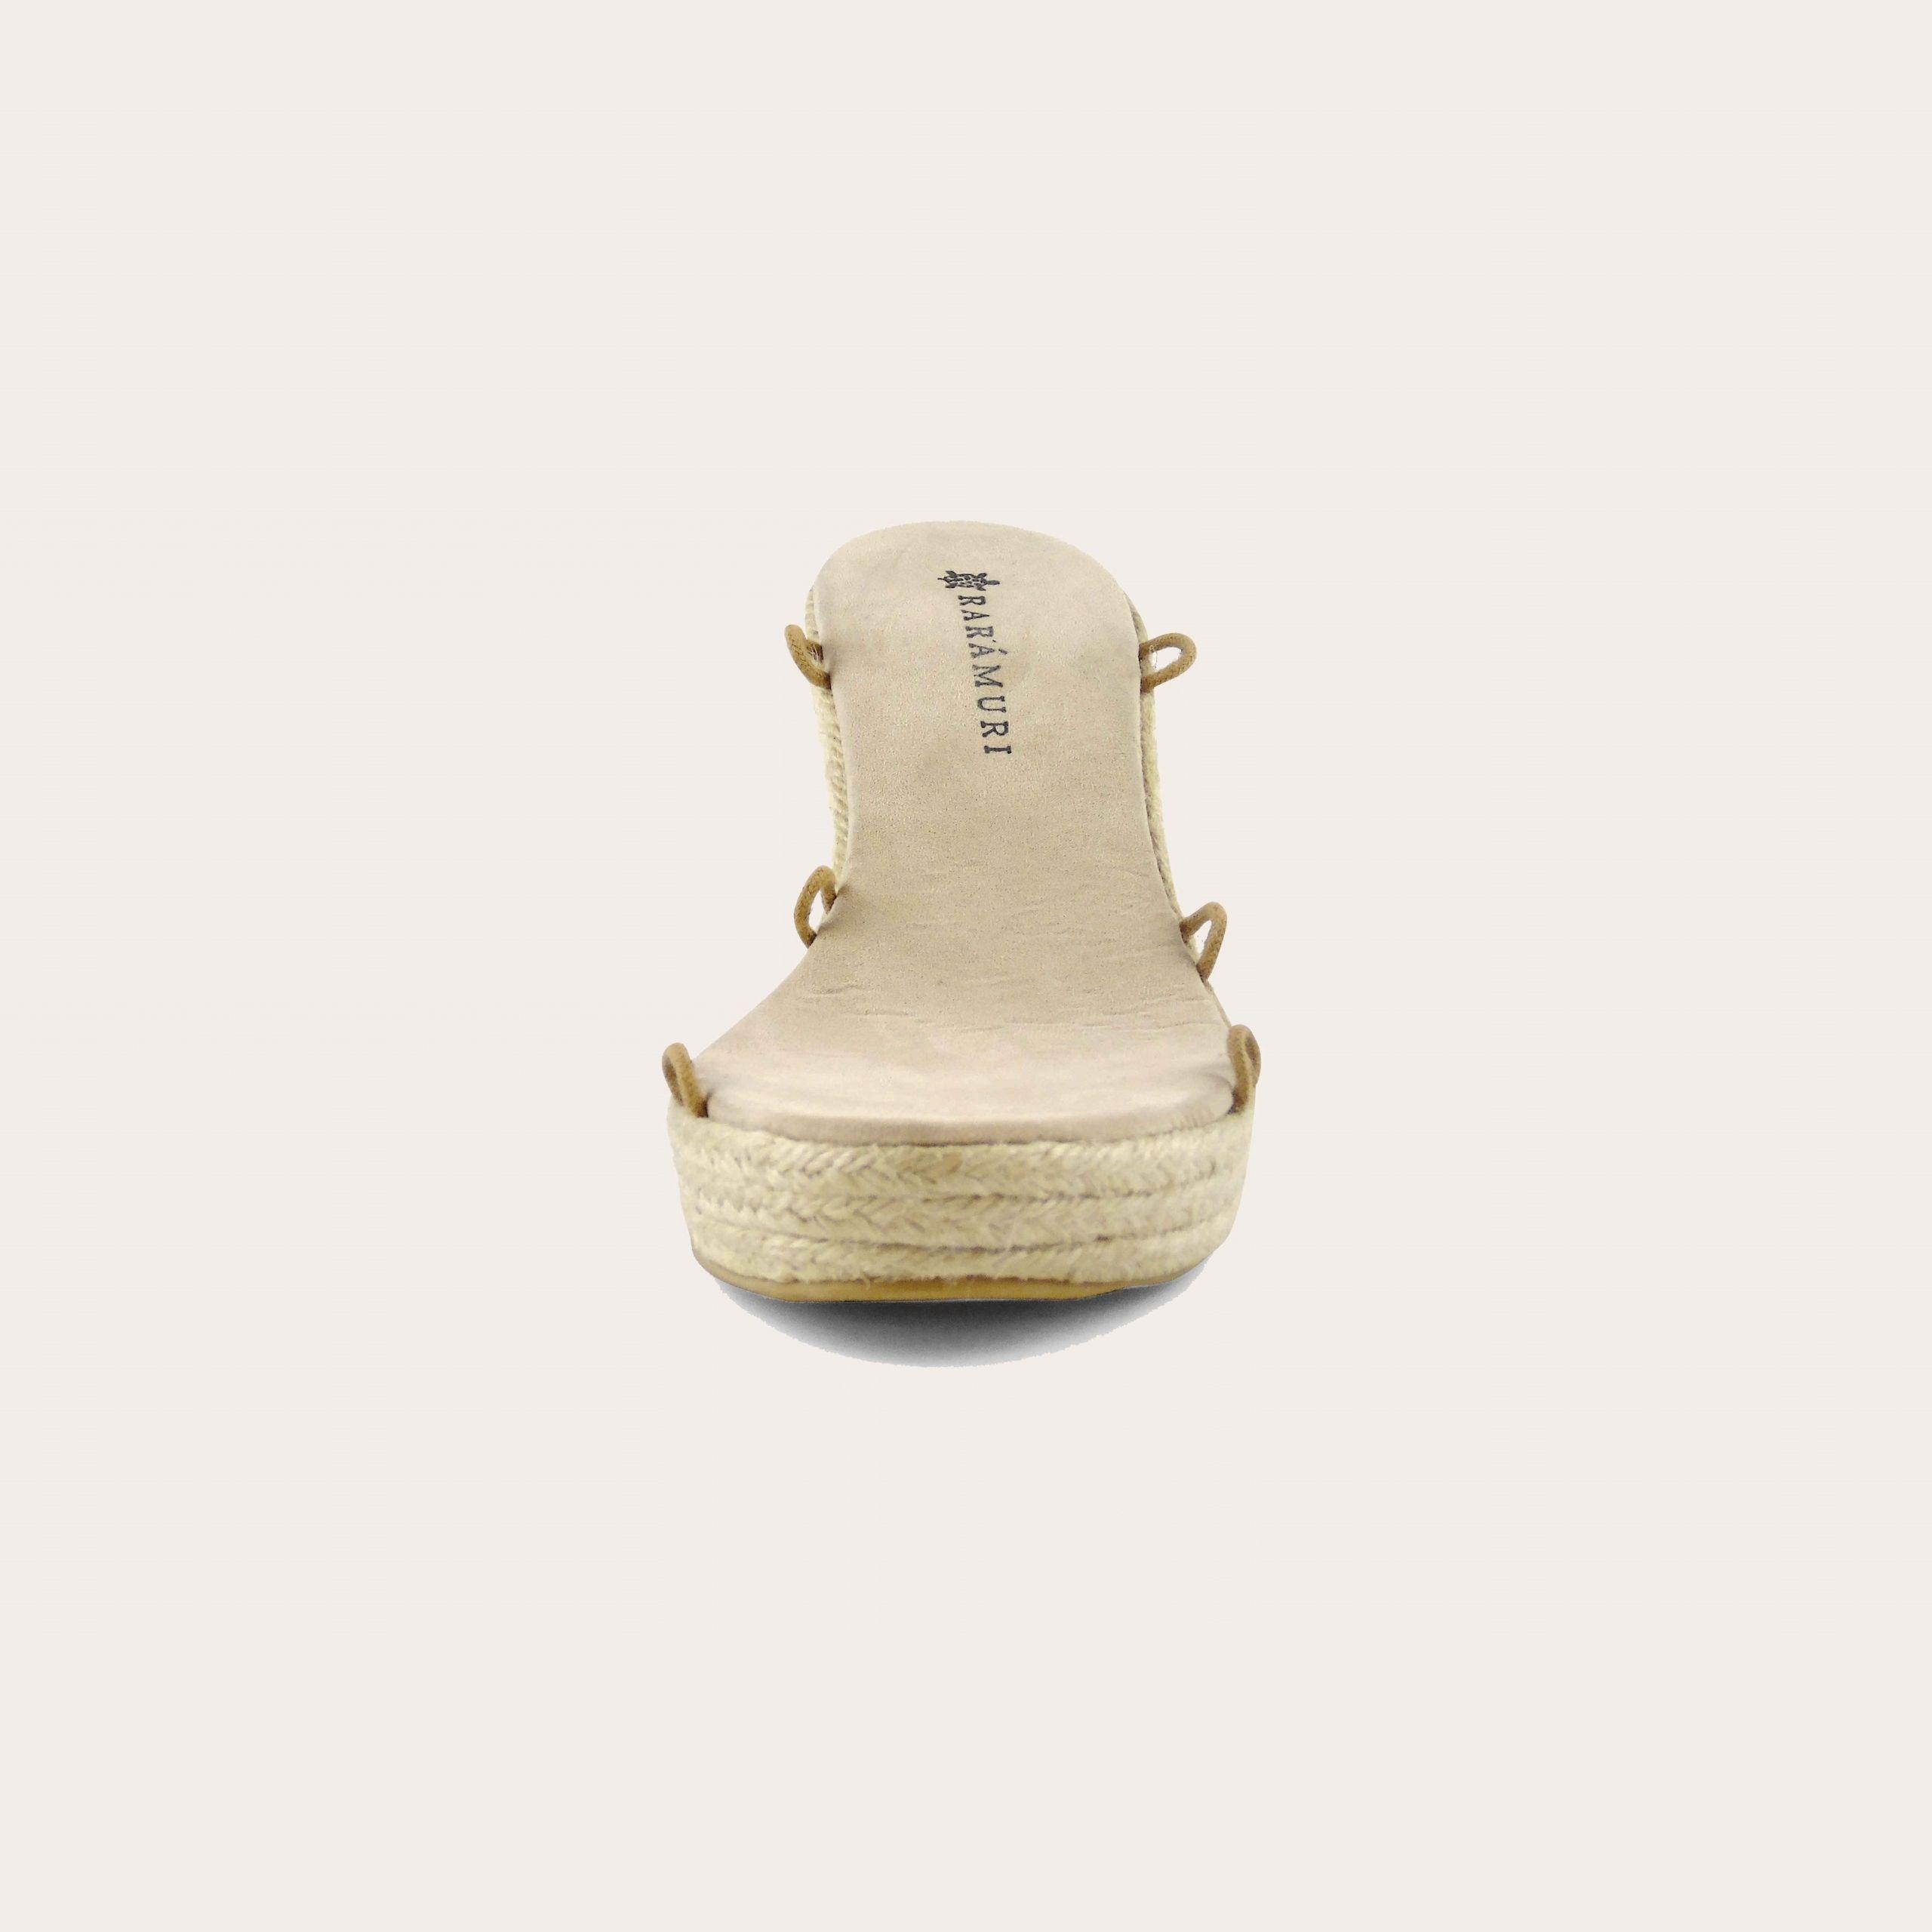 chilon_3_lintsandalen sandals travelsandals vegan sustainable sandals wikkelsandalen